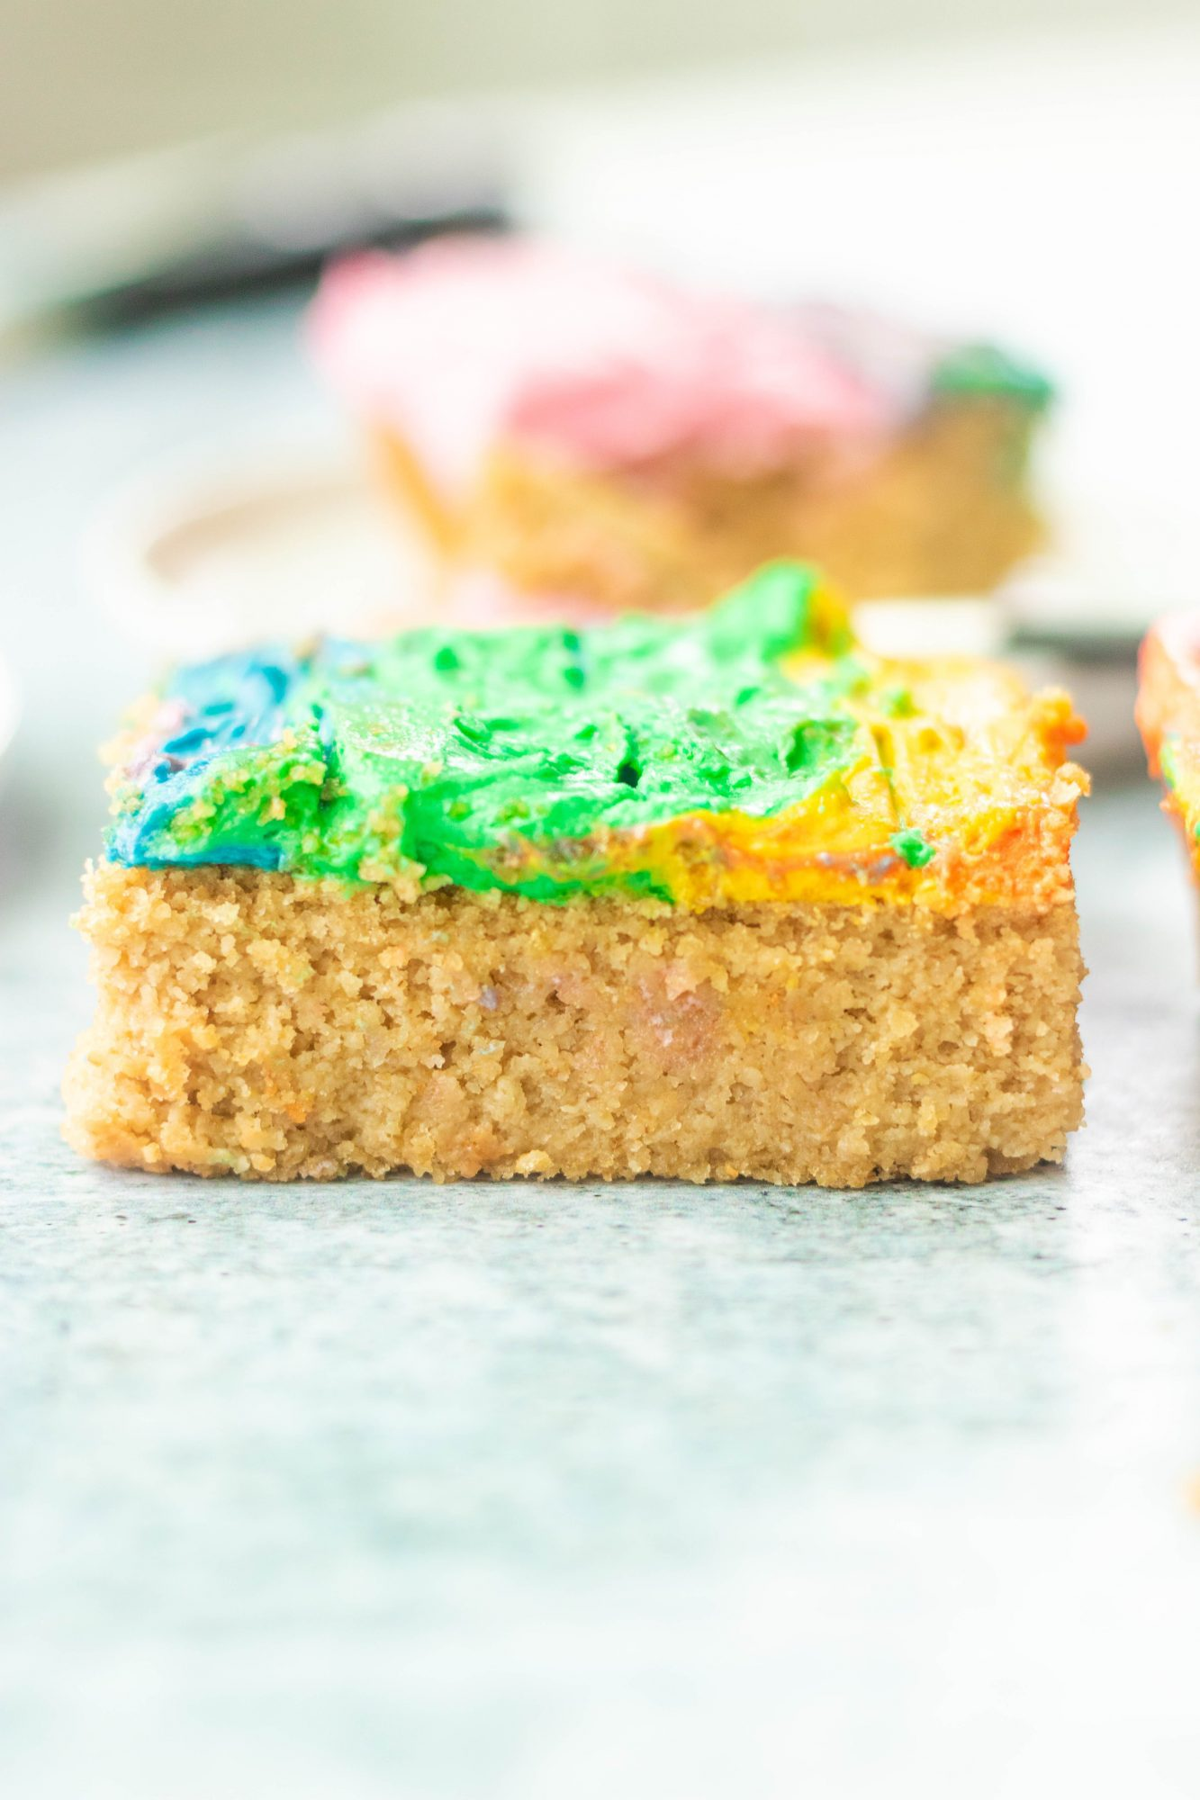 Vegan Gluten-Free Vanilla Cake with Rainbow Frosting